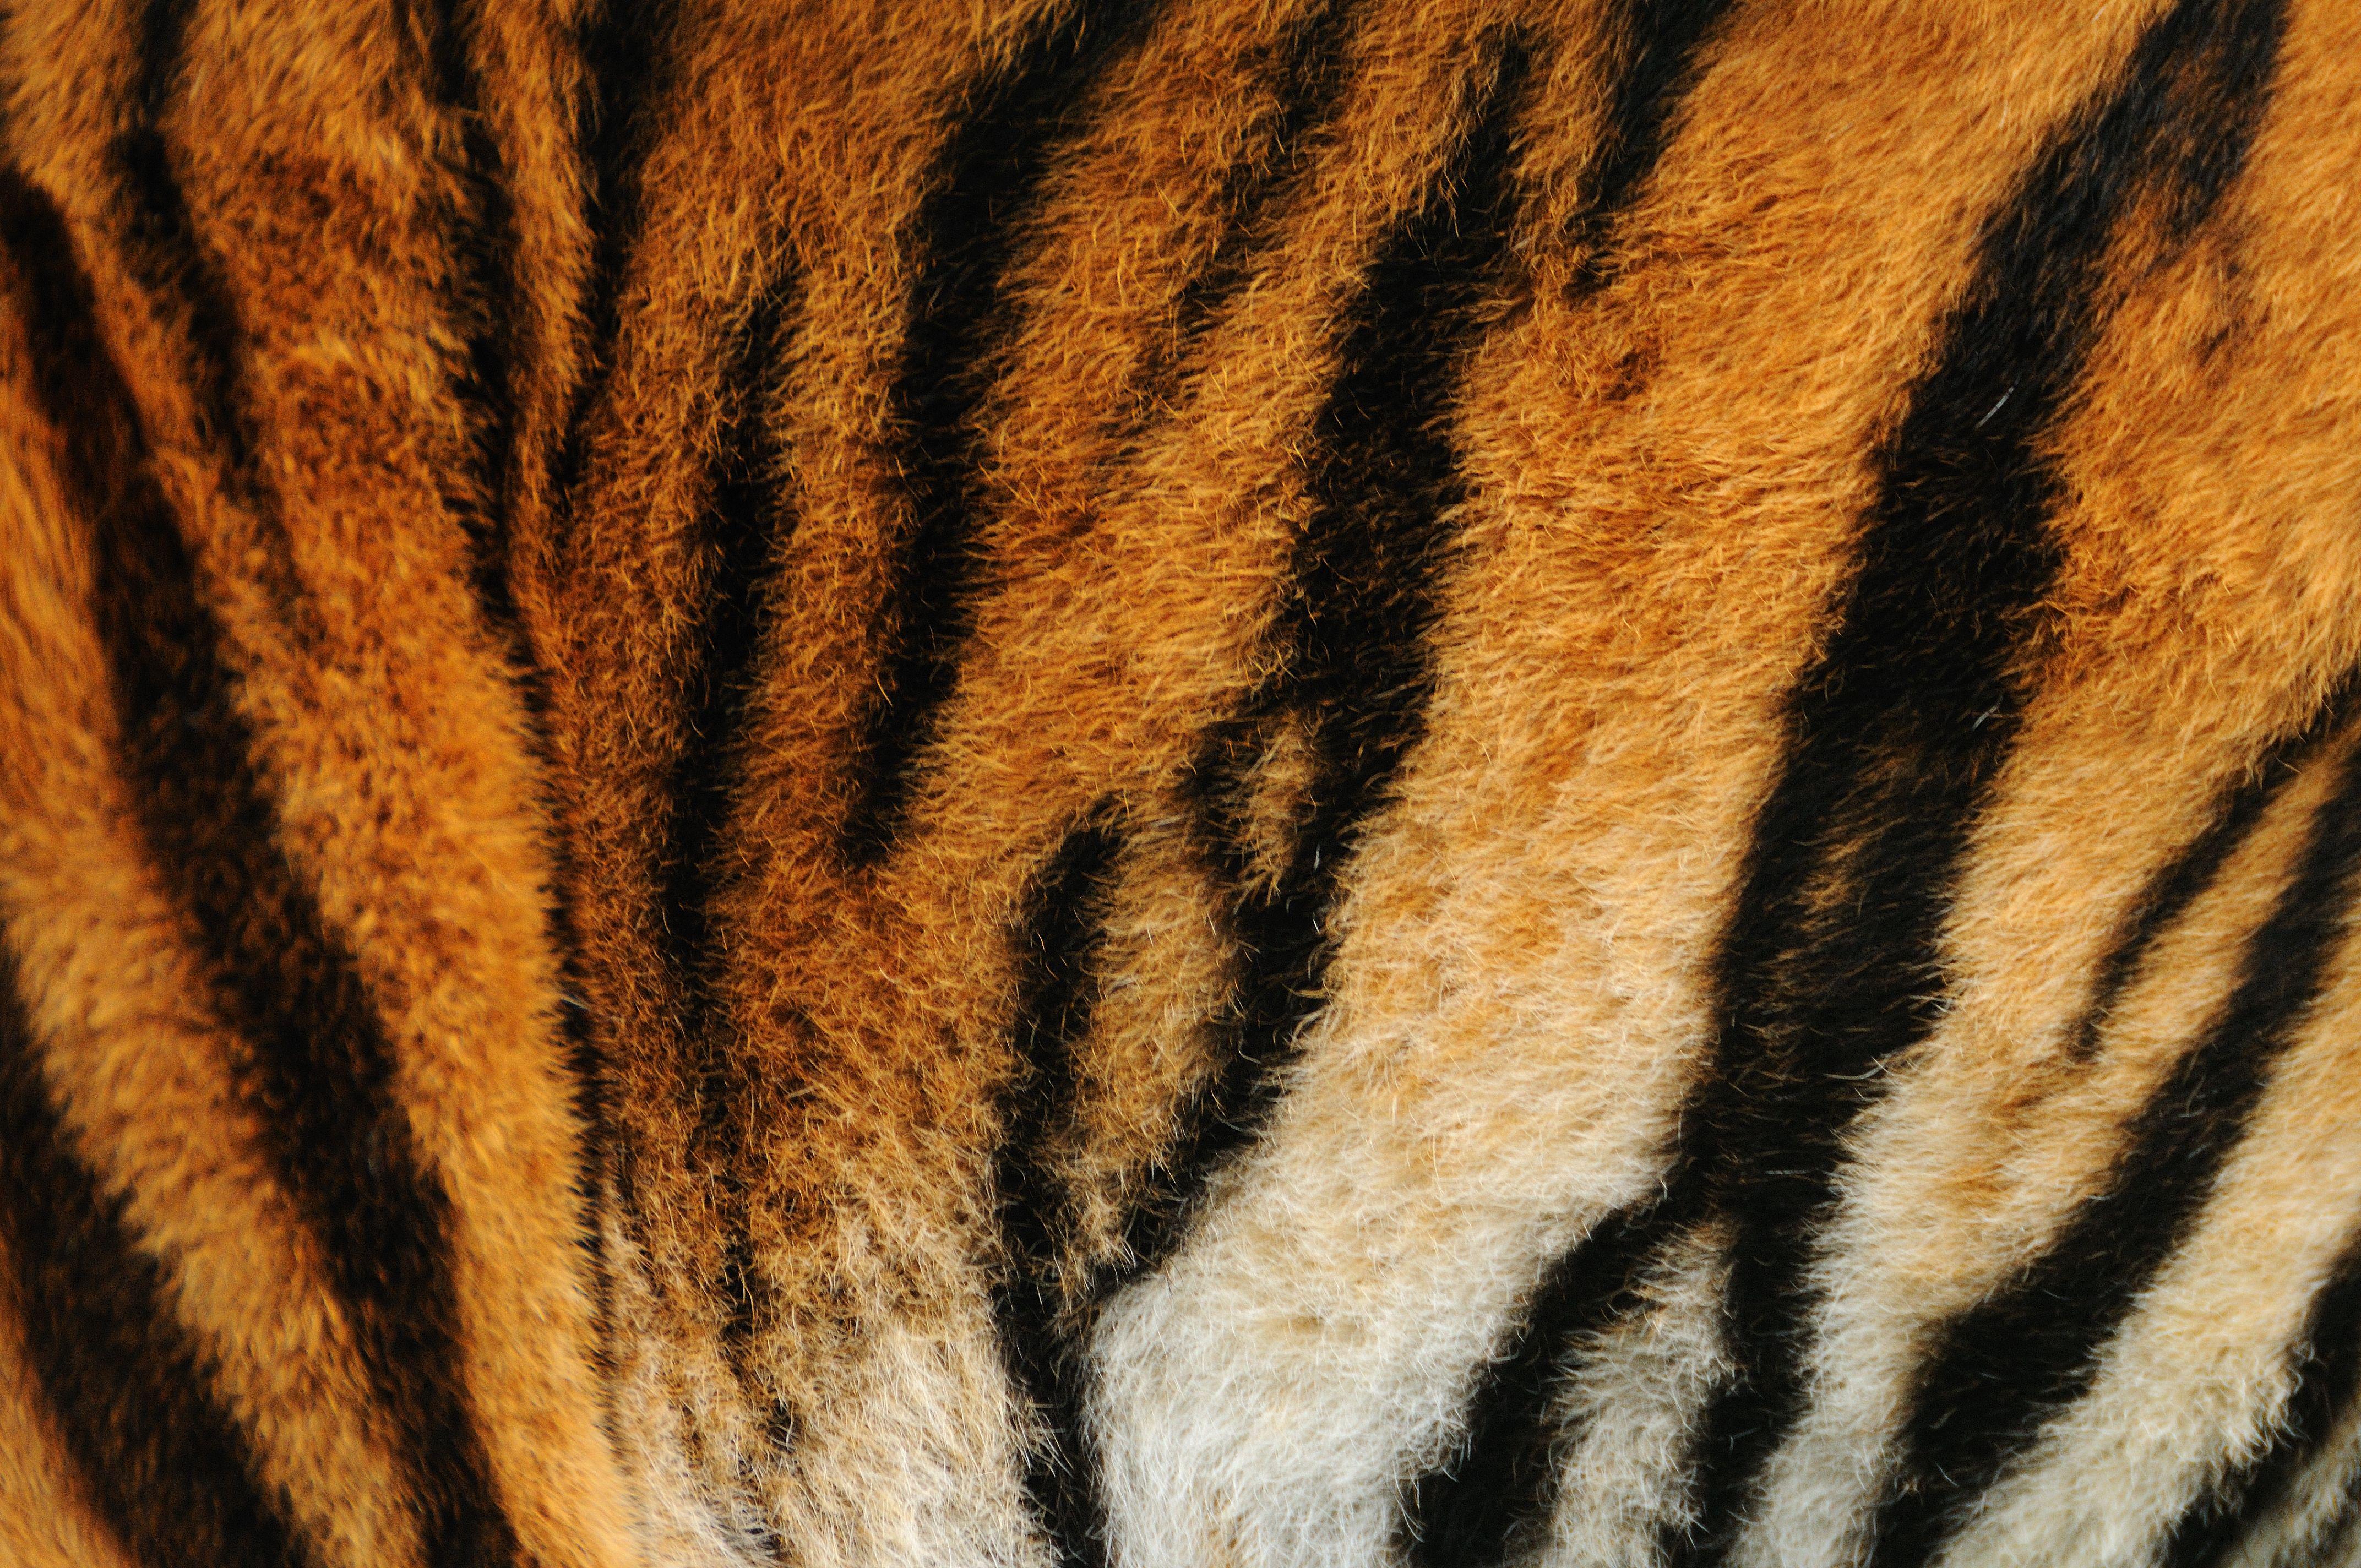 Tiger Print Print Wallpaper Animal Print Wallpaper